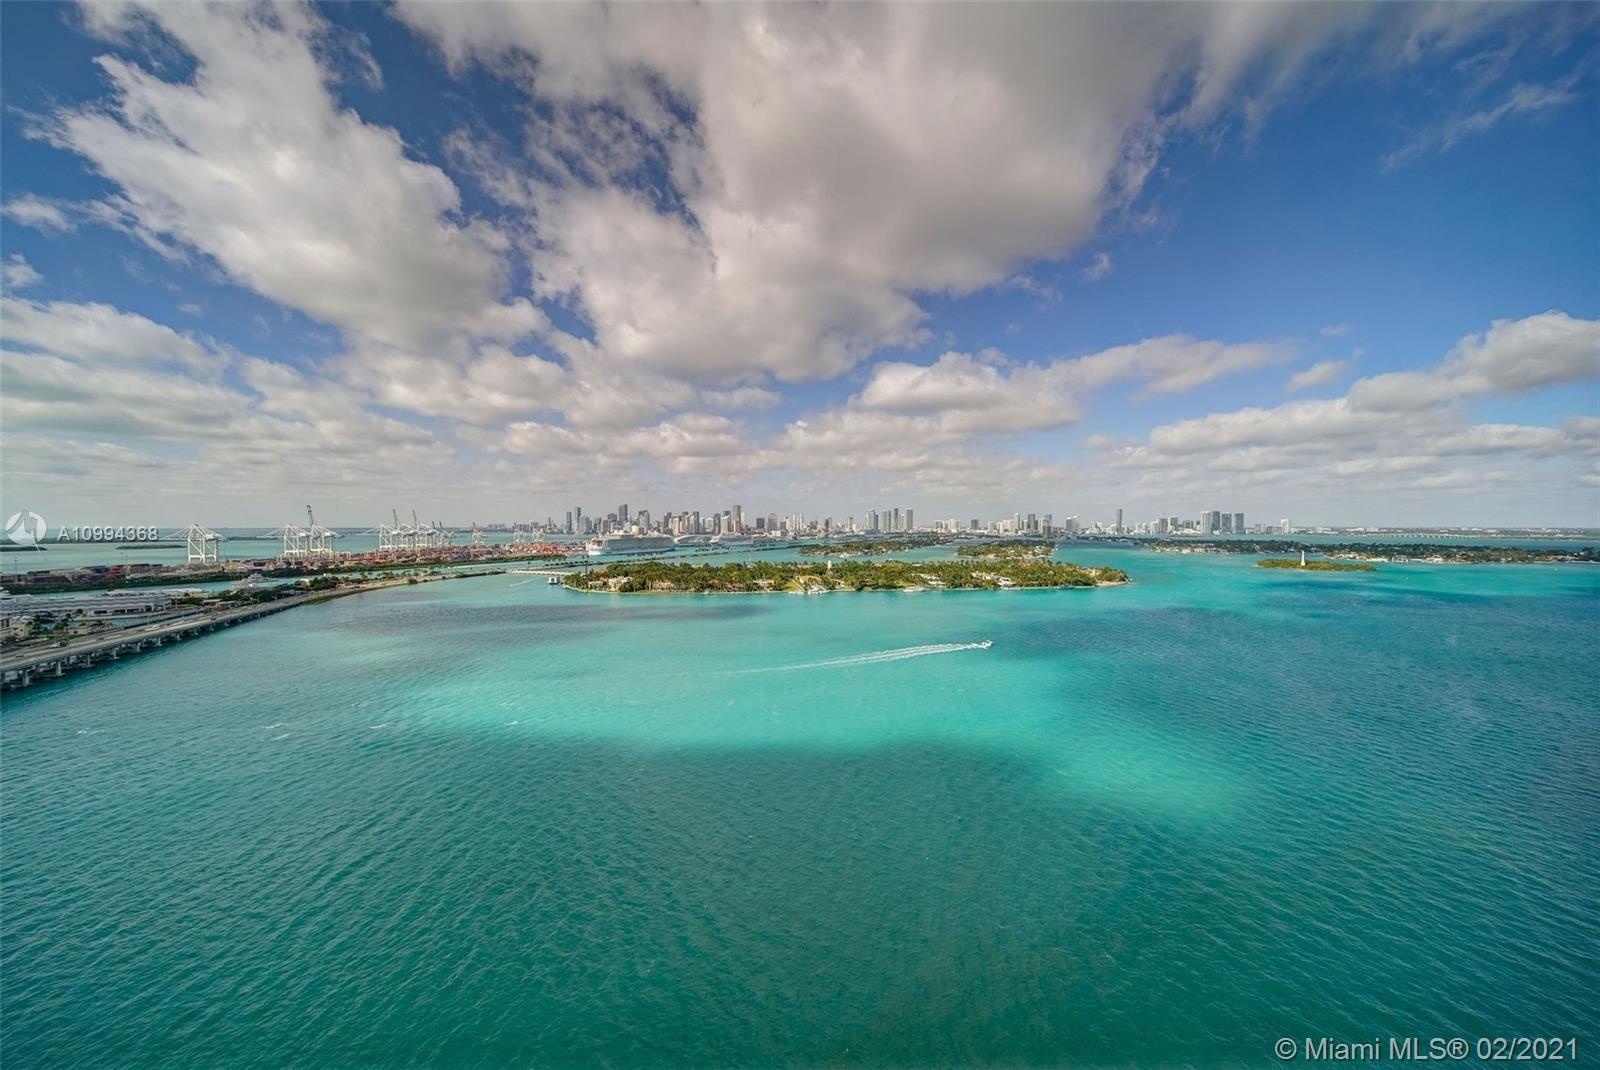 650 West Ave #3007, Miami Beach, FL 33139 - #: A10994368